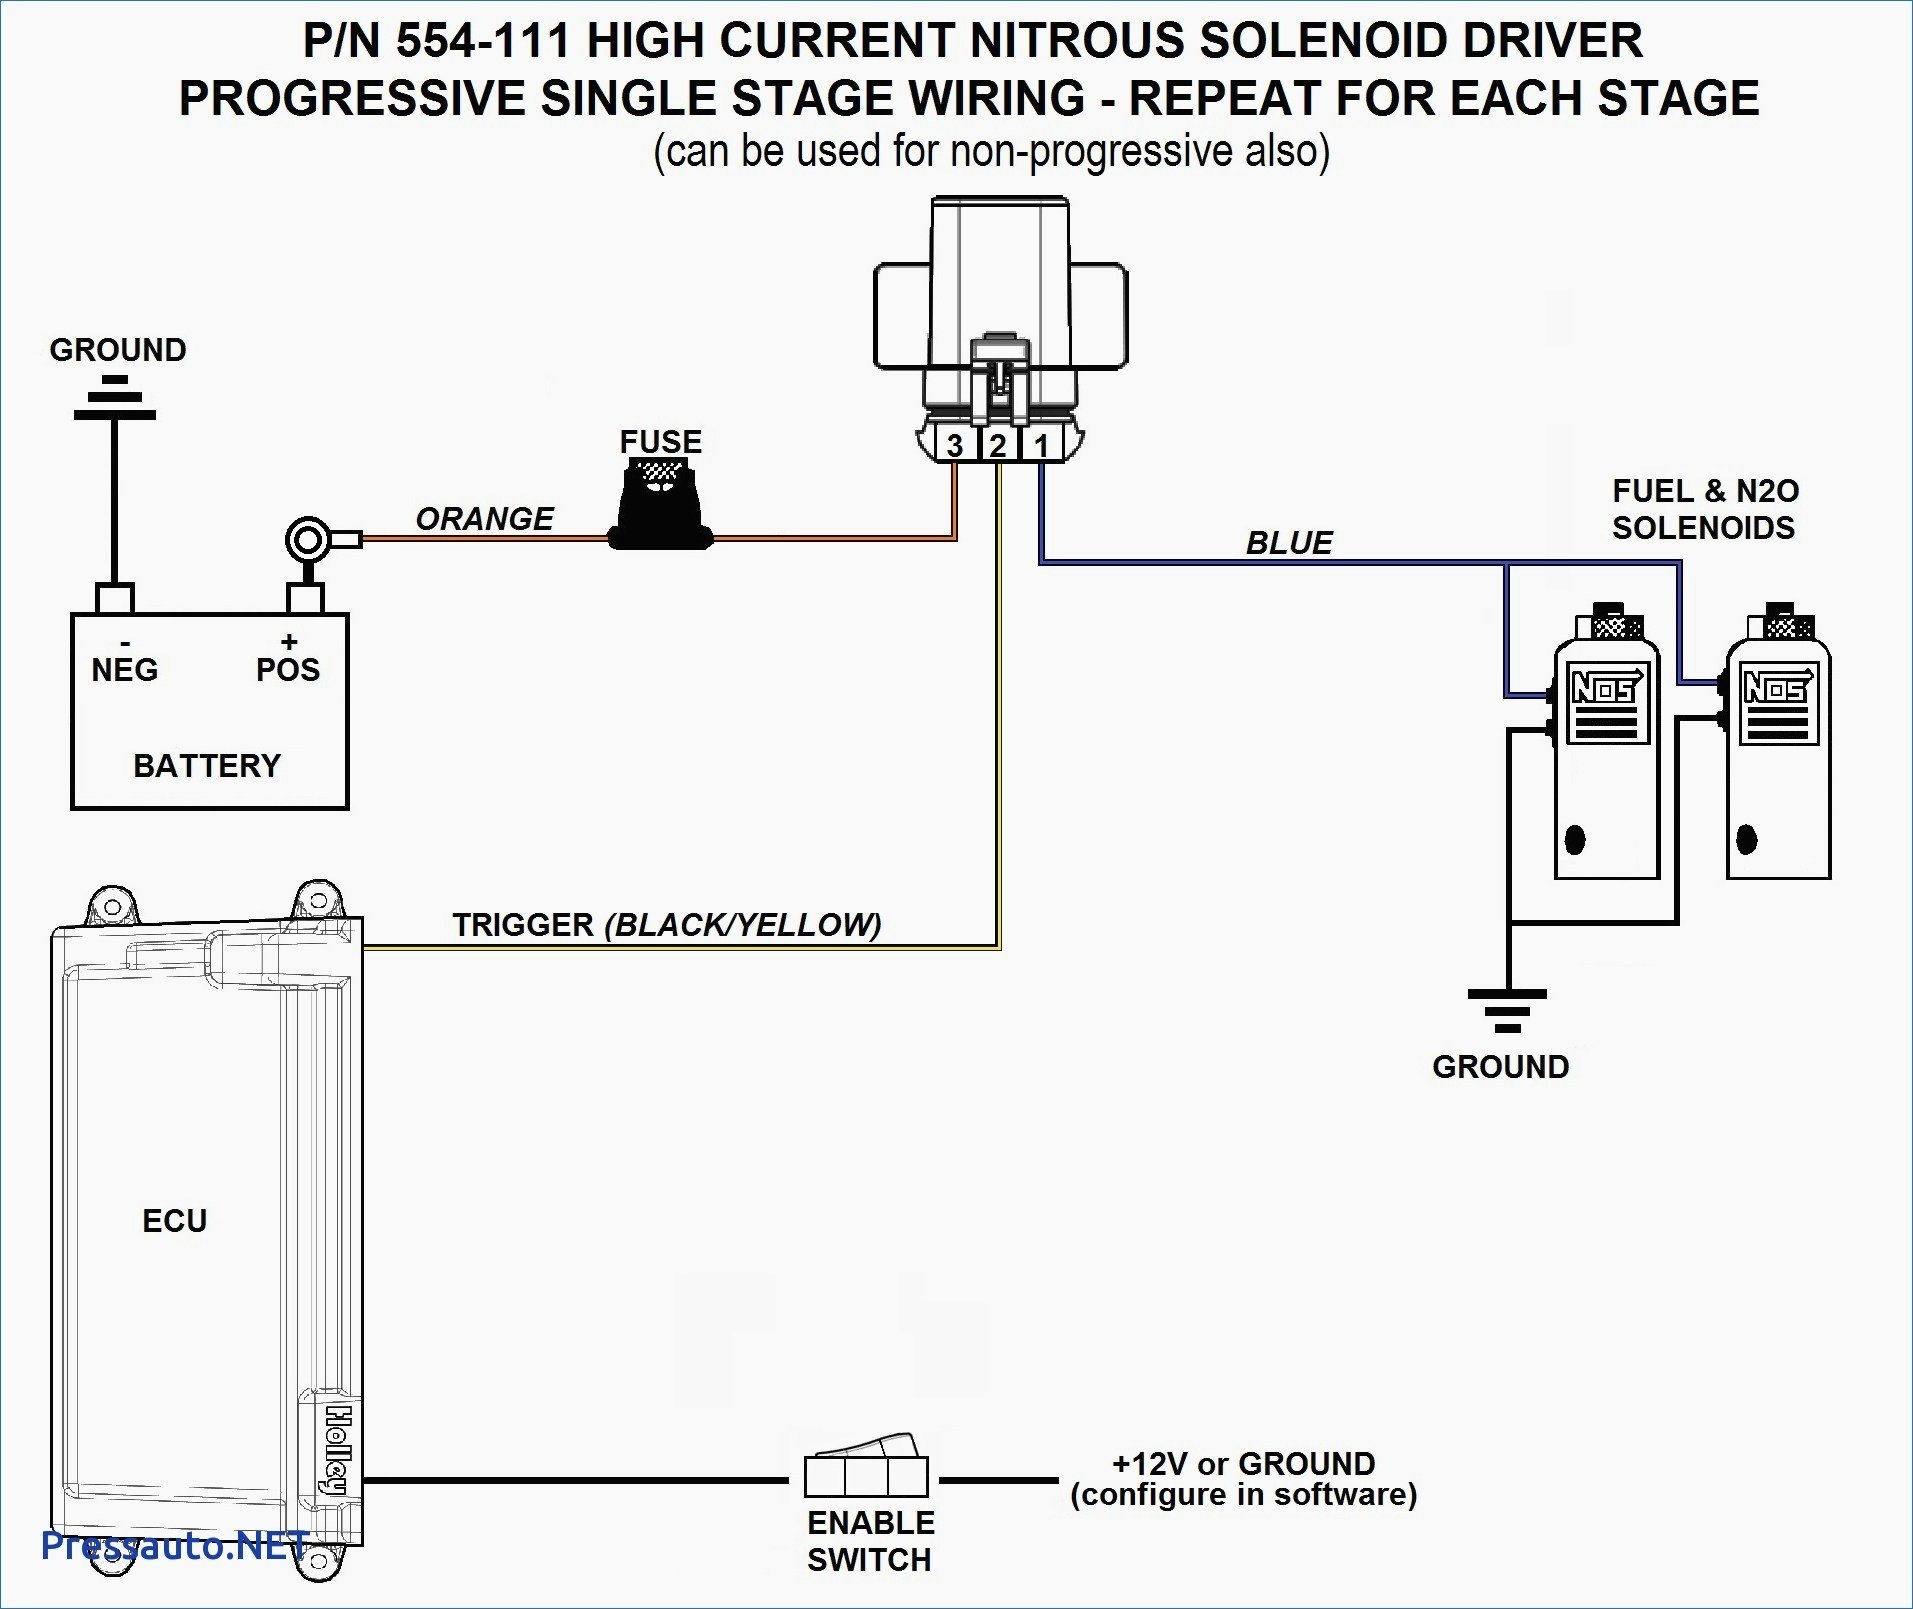 Honda Gx200 Wiring Diagram | Wiring Diagram - Honda Gx160 Electric Start Wiring Diagram